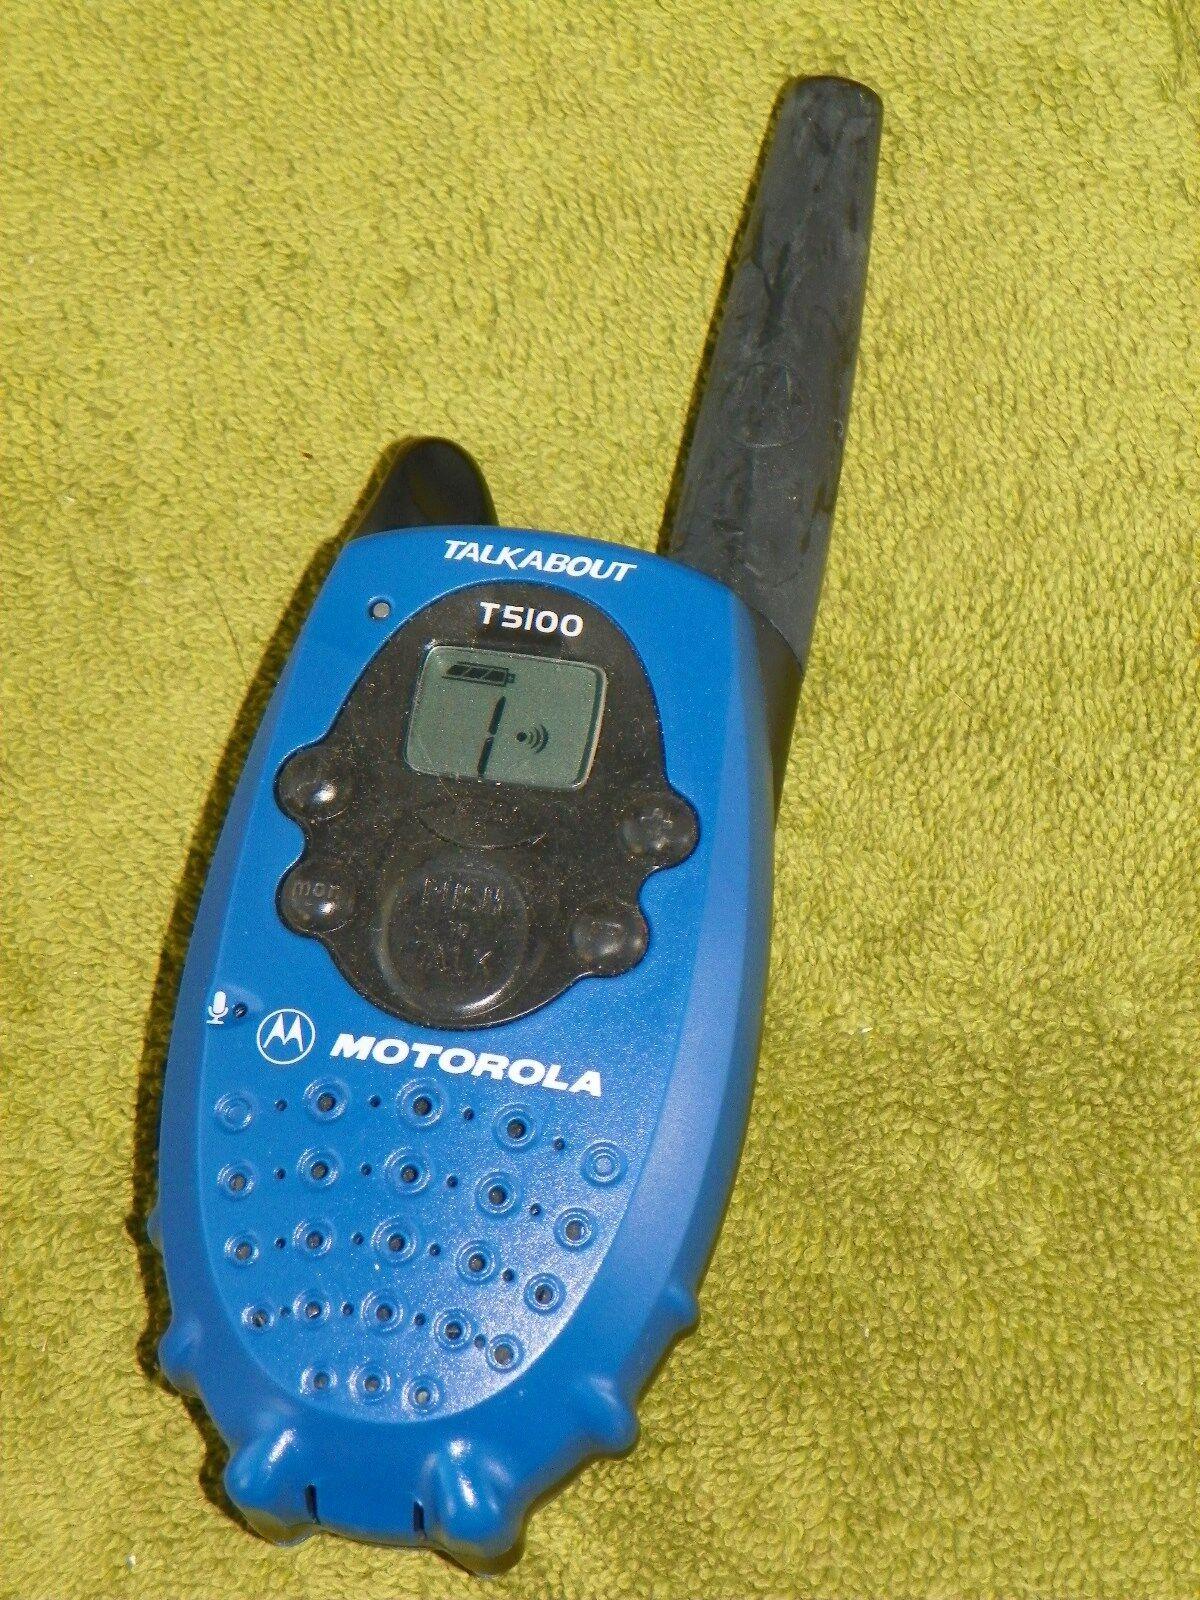 motorola talkabout t5100 two way radio ebay rh ebay com motorola t5100 manual usuario motorola talkabout t5100 manual pdf